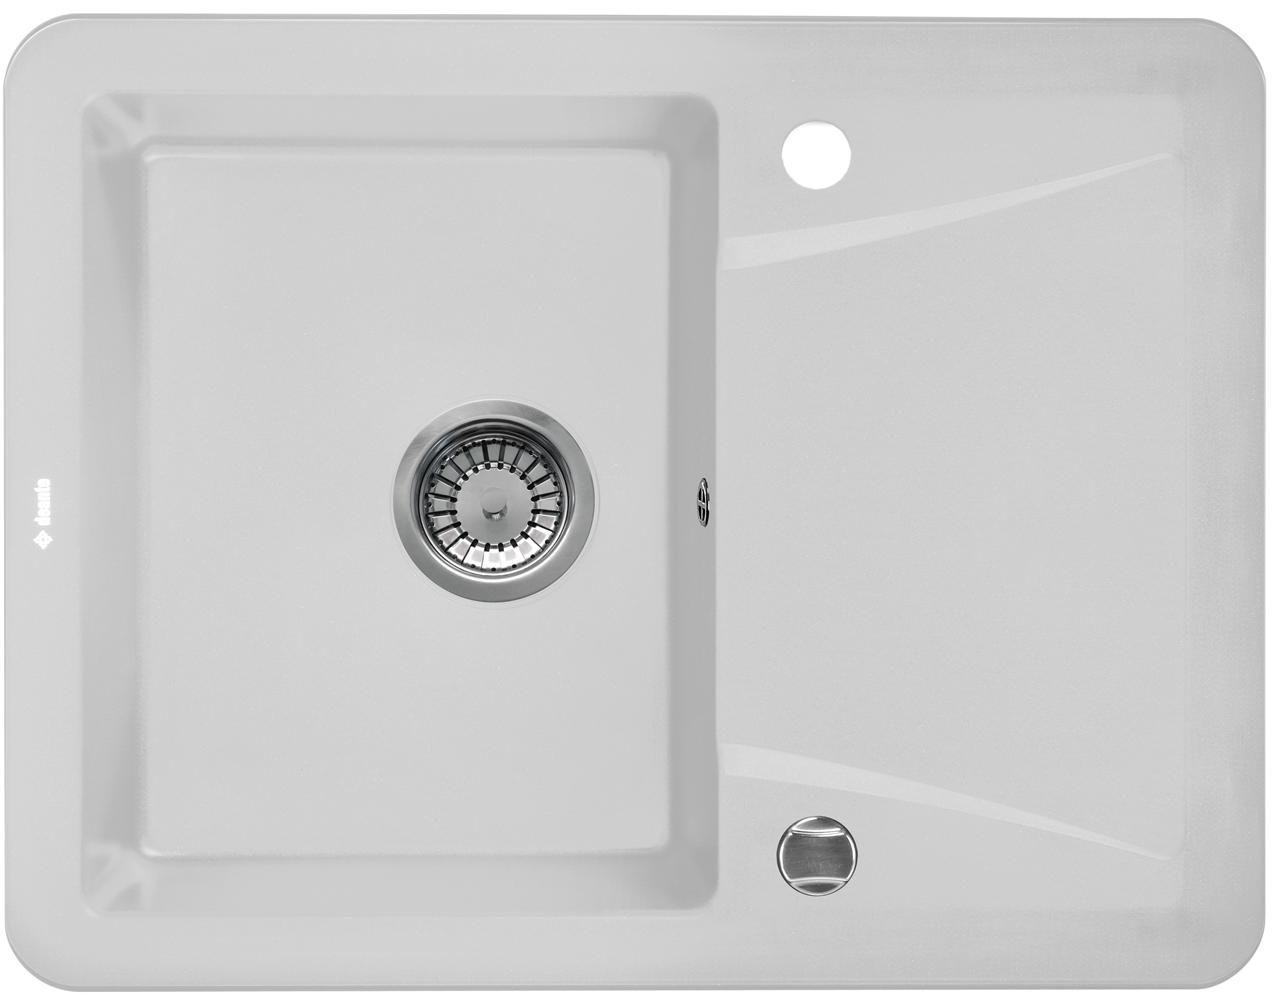 DE-Vivo 1 | Composite sinks, White granite kitchen and Black granite ...